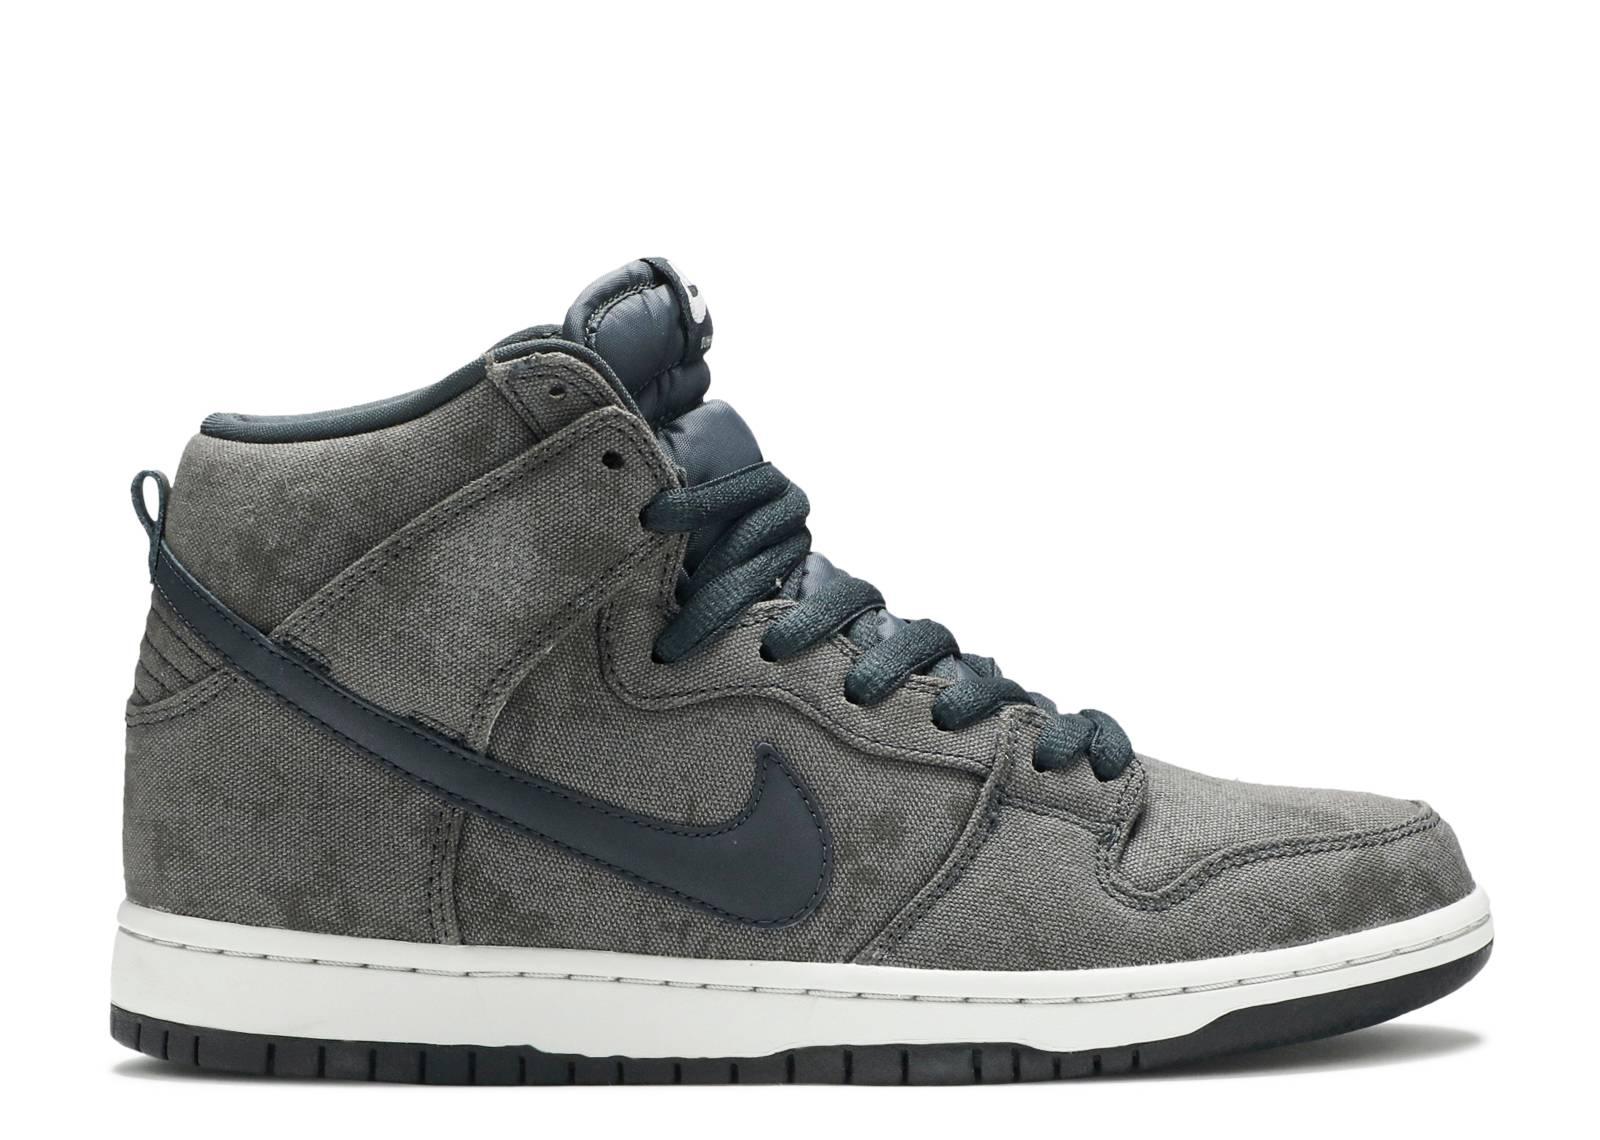 premium selection 9725e 6d9a5 Dunk High Pro Sb - Nike - 305050 011 - neutral grey ...